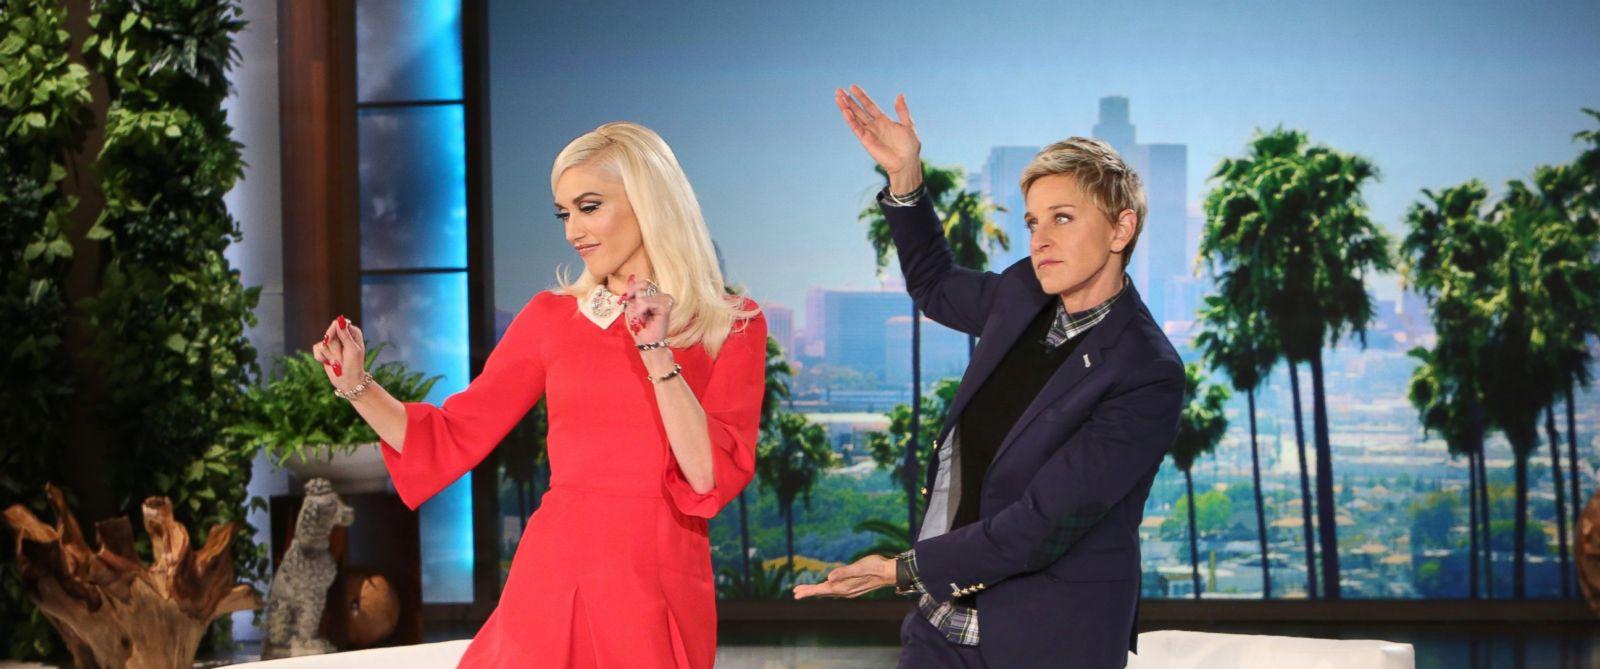 Gwen Stefani Shares Blake Shelton S Secret To Rapid Weight Loss